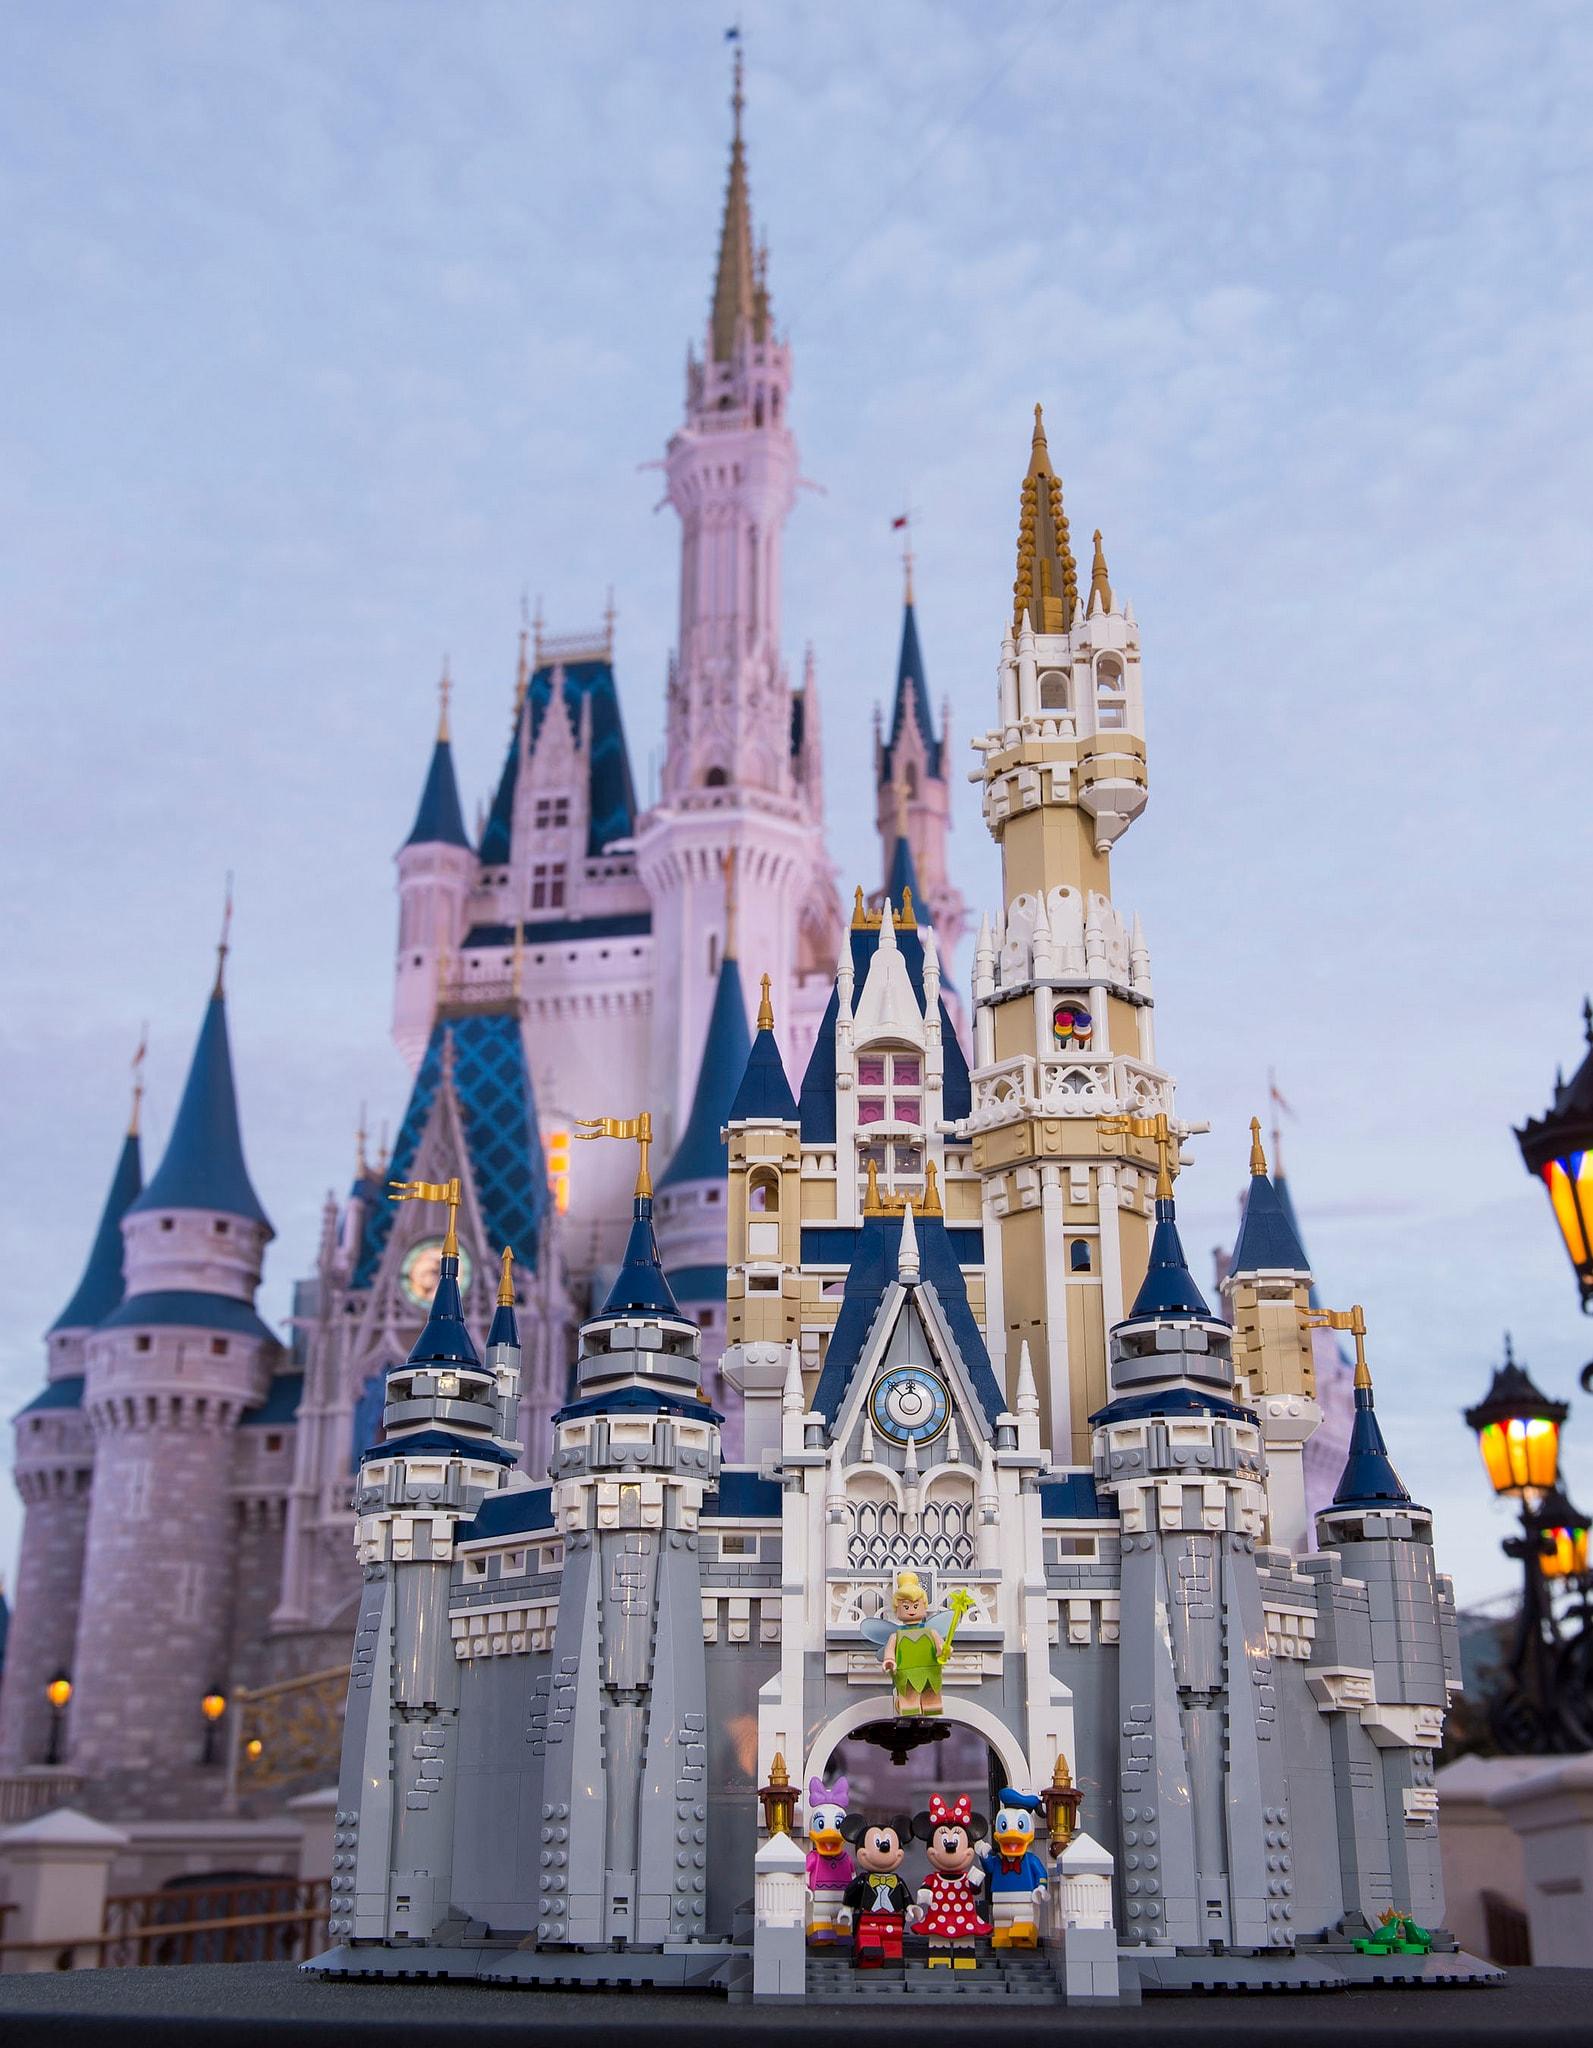 LEGO 71040 The Disney Castle vs reale – 2